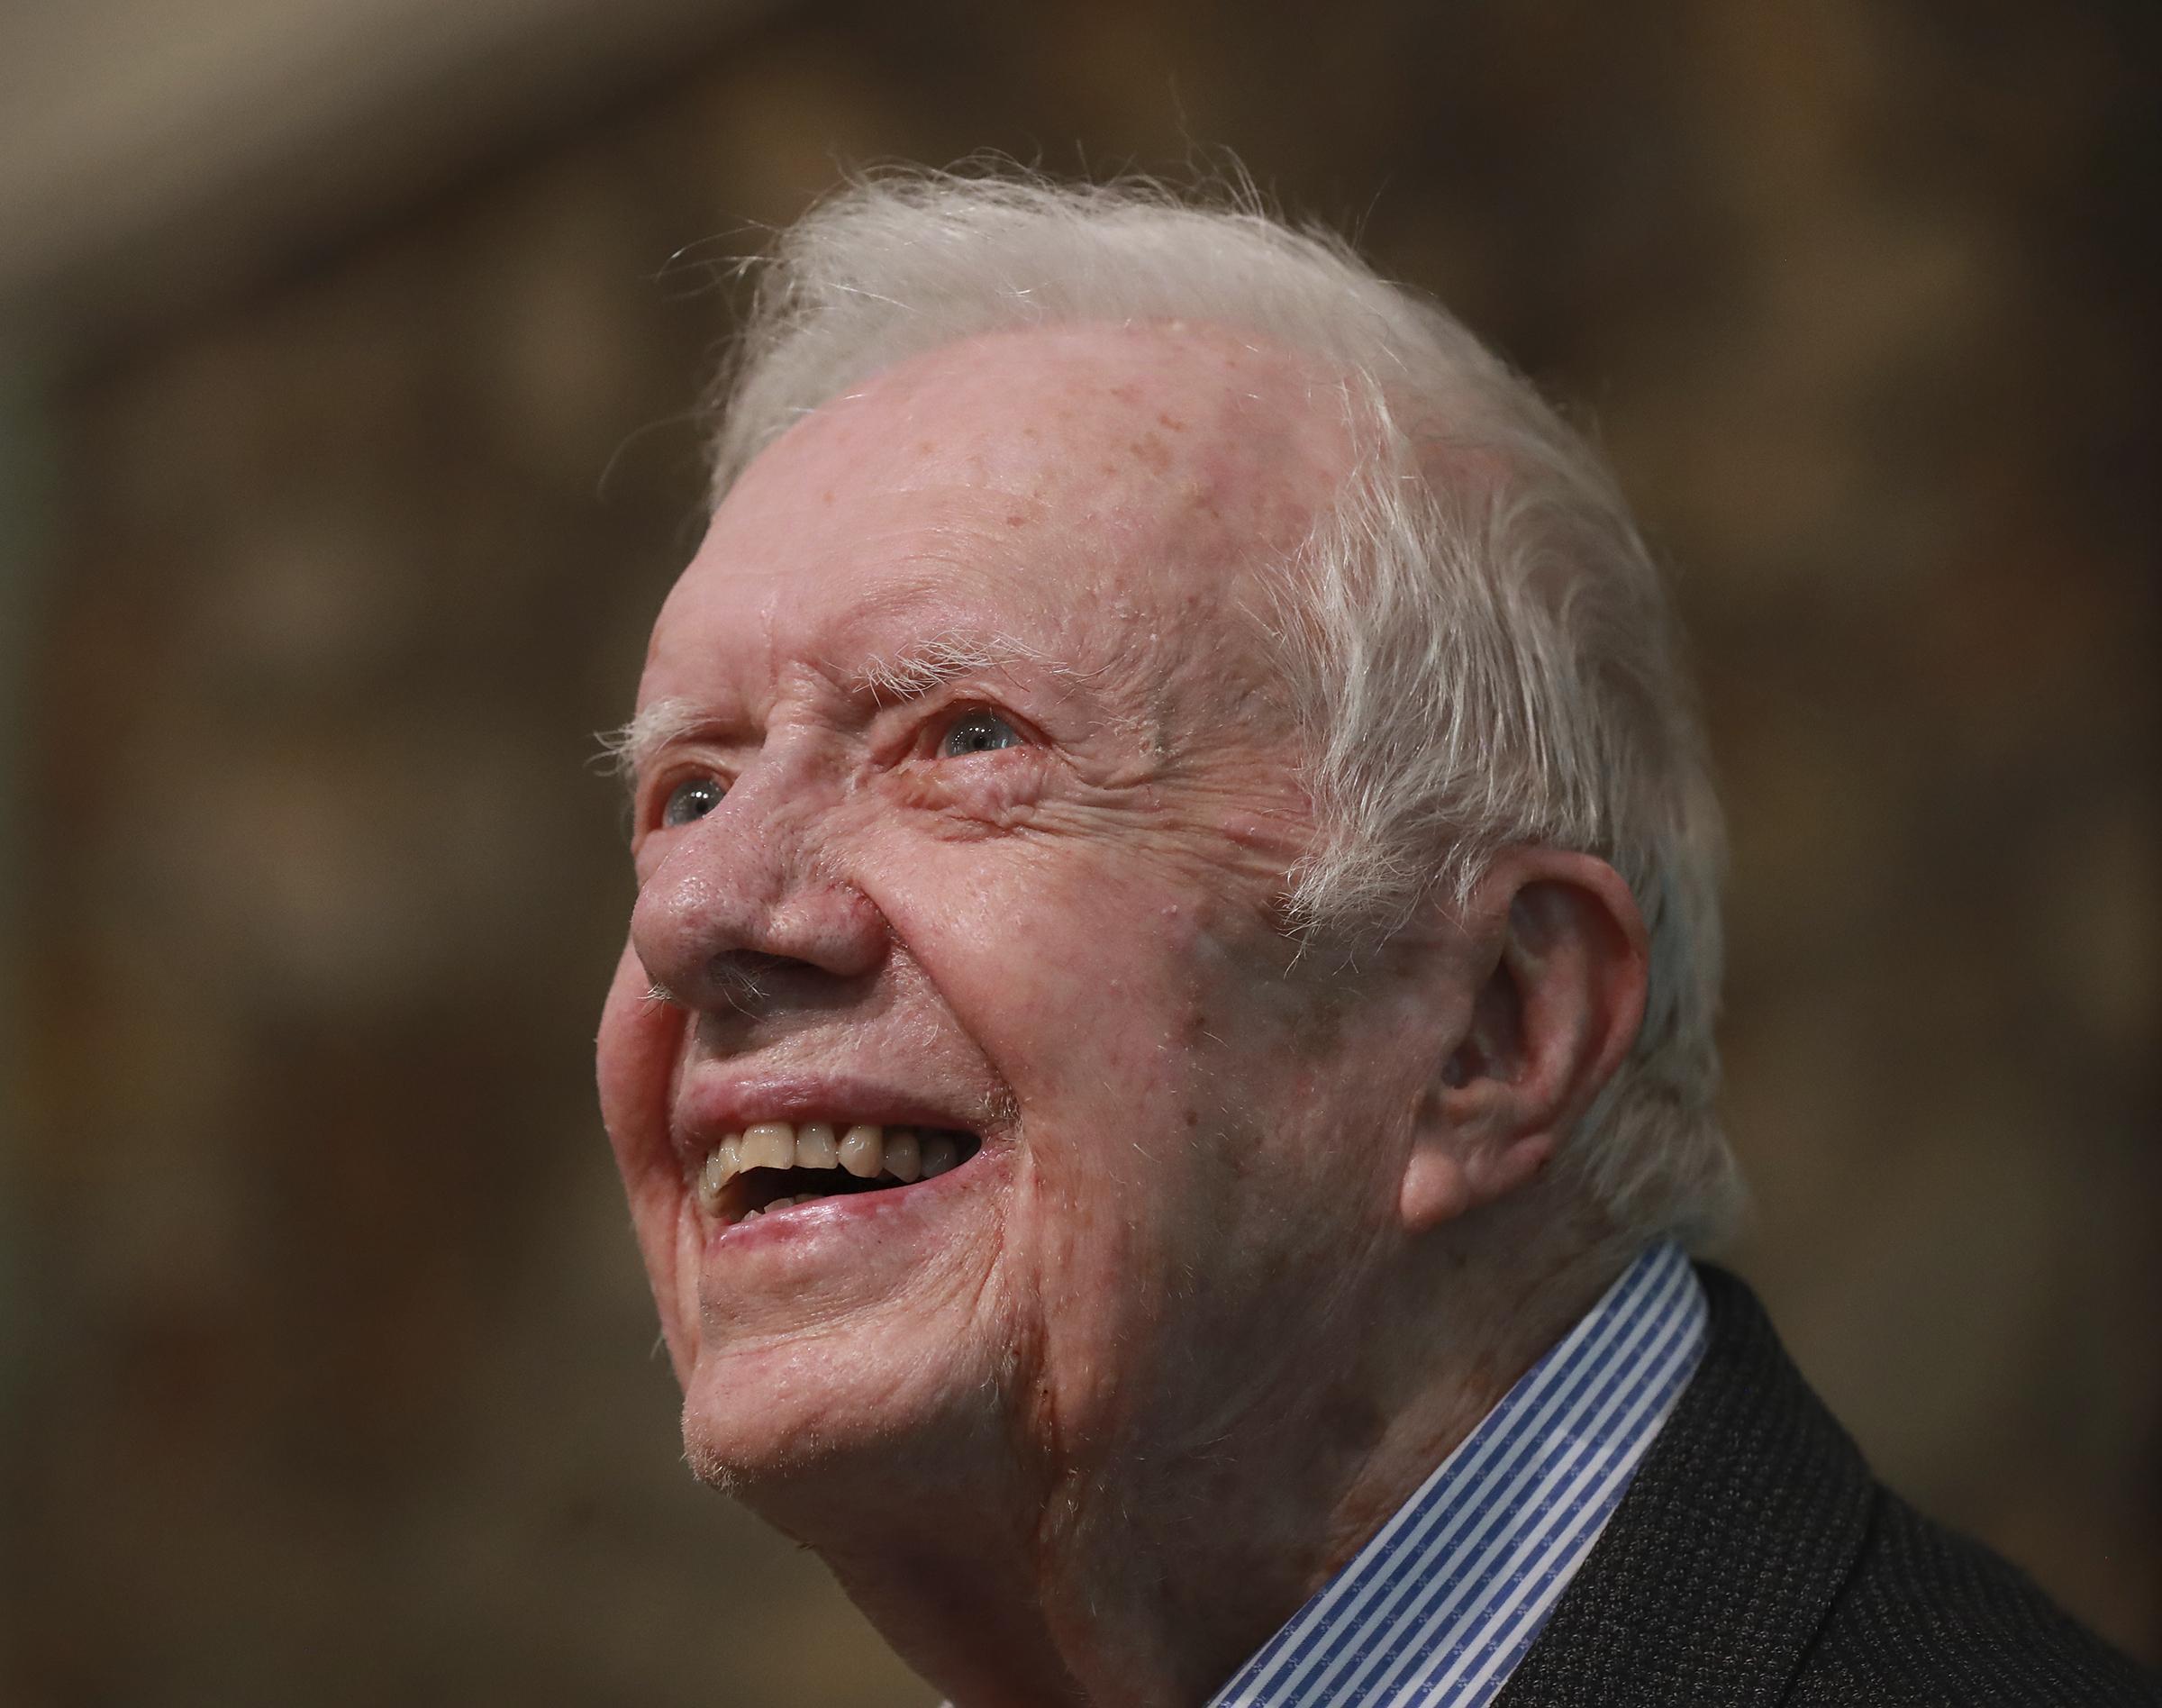 Jimmy Carter hospitalized with brain injury